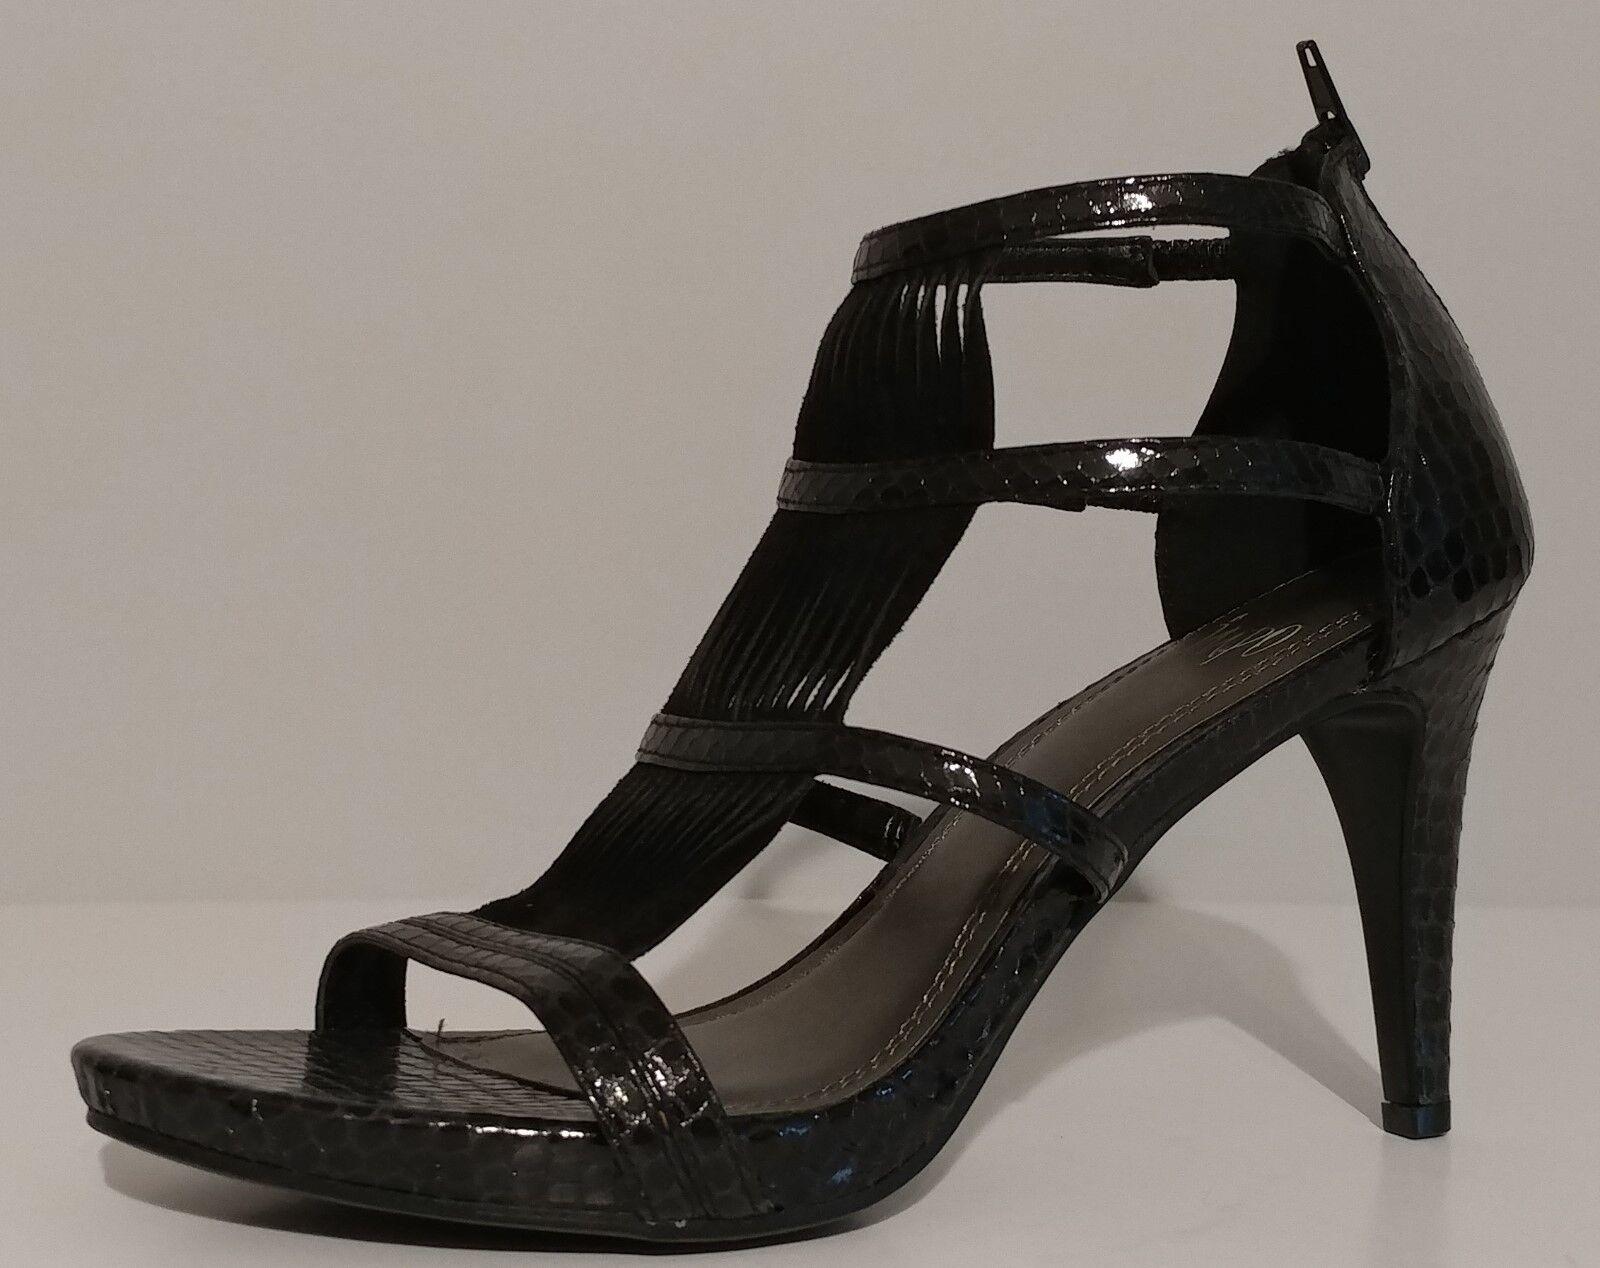 NEW   IMPO Black Snake Embossed Sandals 3.5    Heels Size 8M US 38M EUR 4097ec